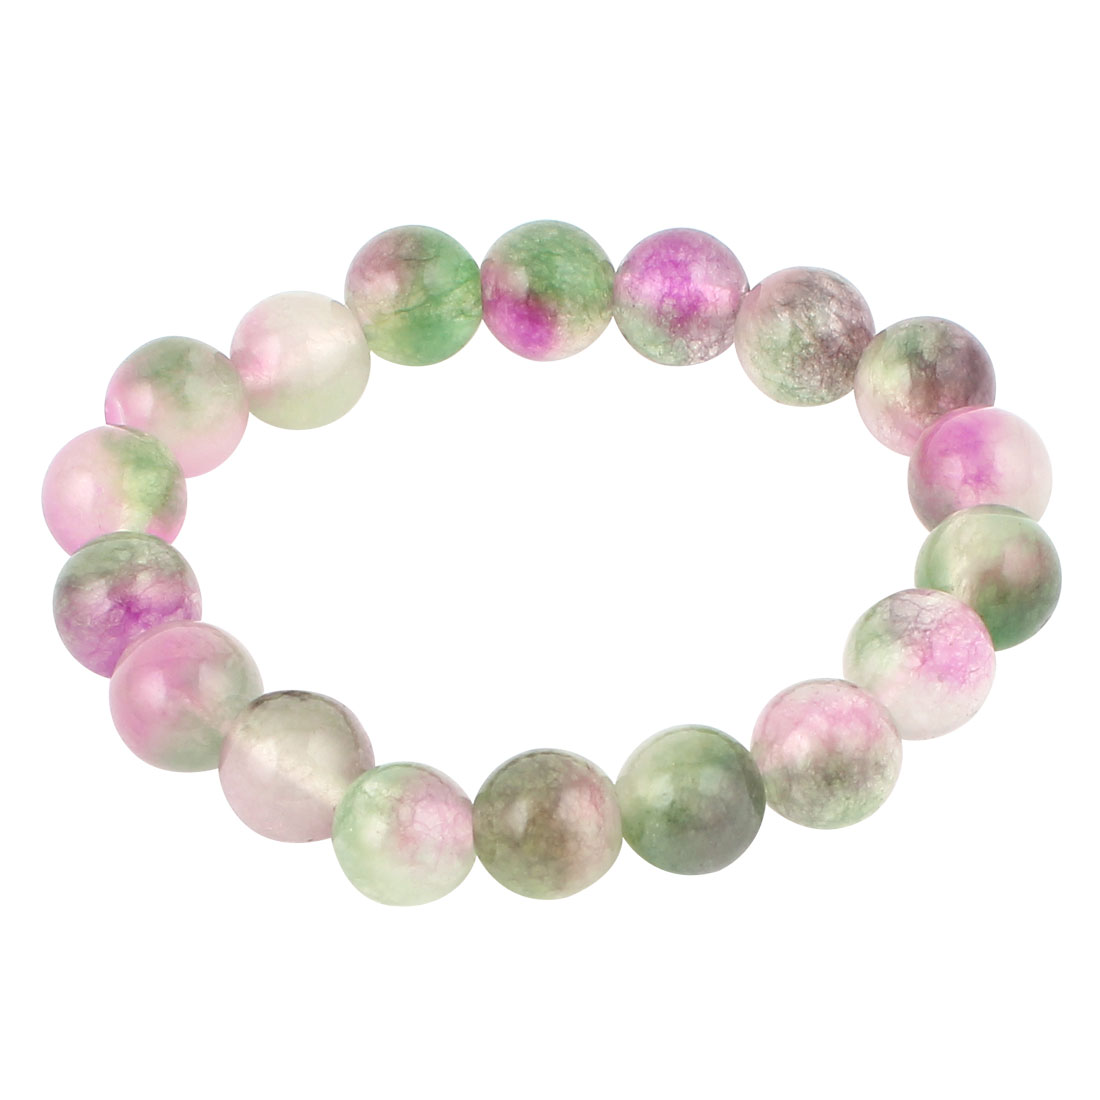 Elasticated 10mm Beads Linked Stretch Bracelet Wrist Decor Purple